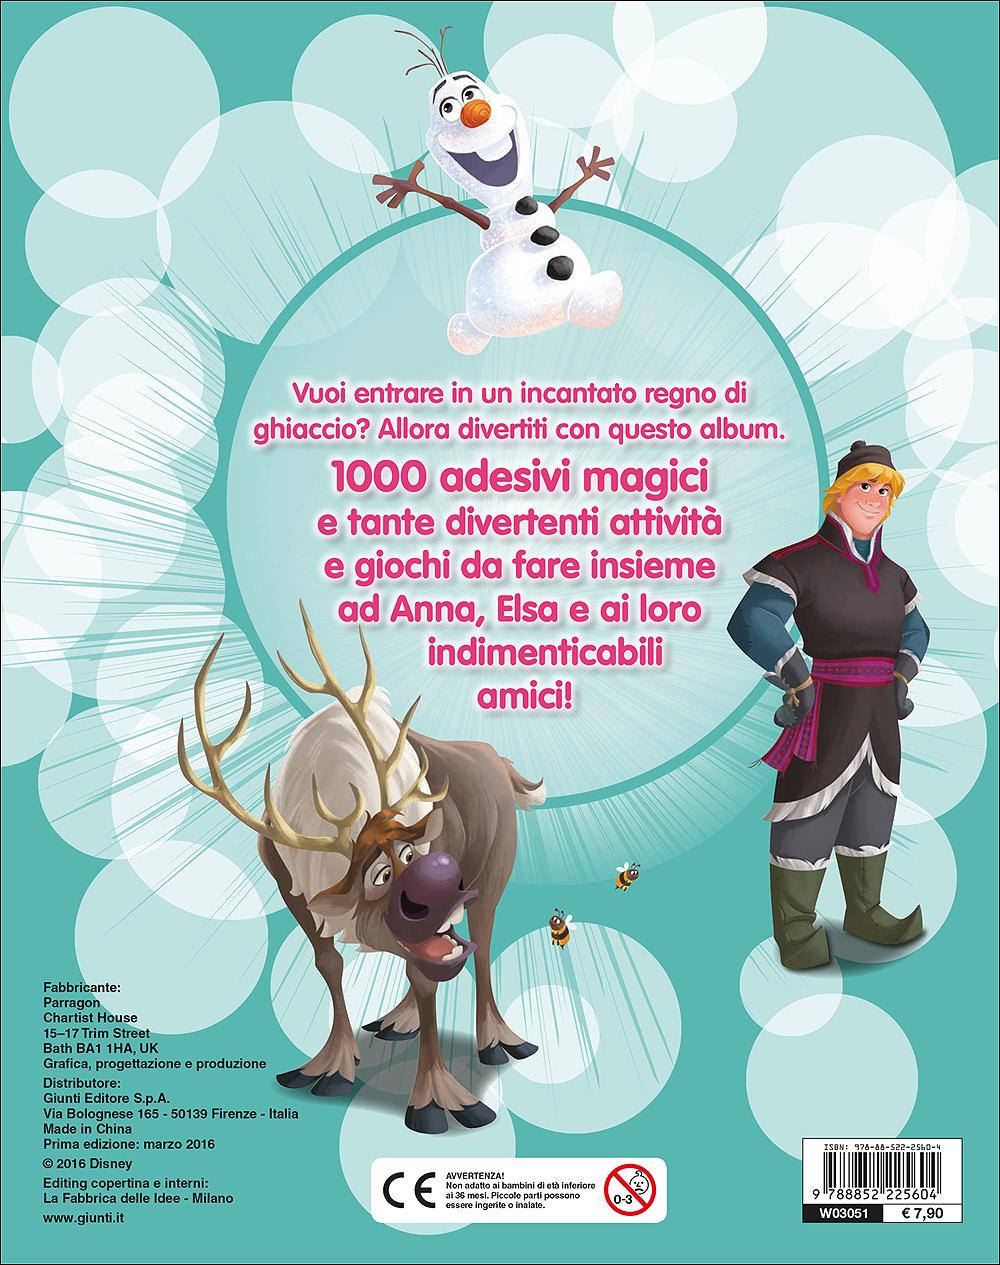 500/1000 Stickers - Frozen. 1000 Stickers